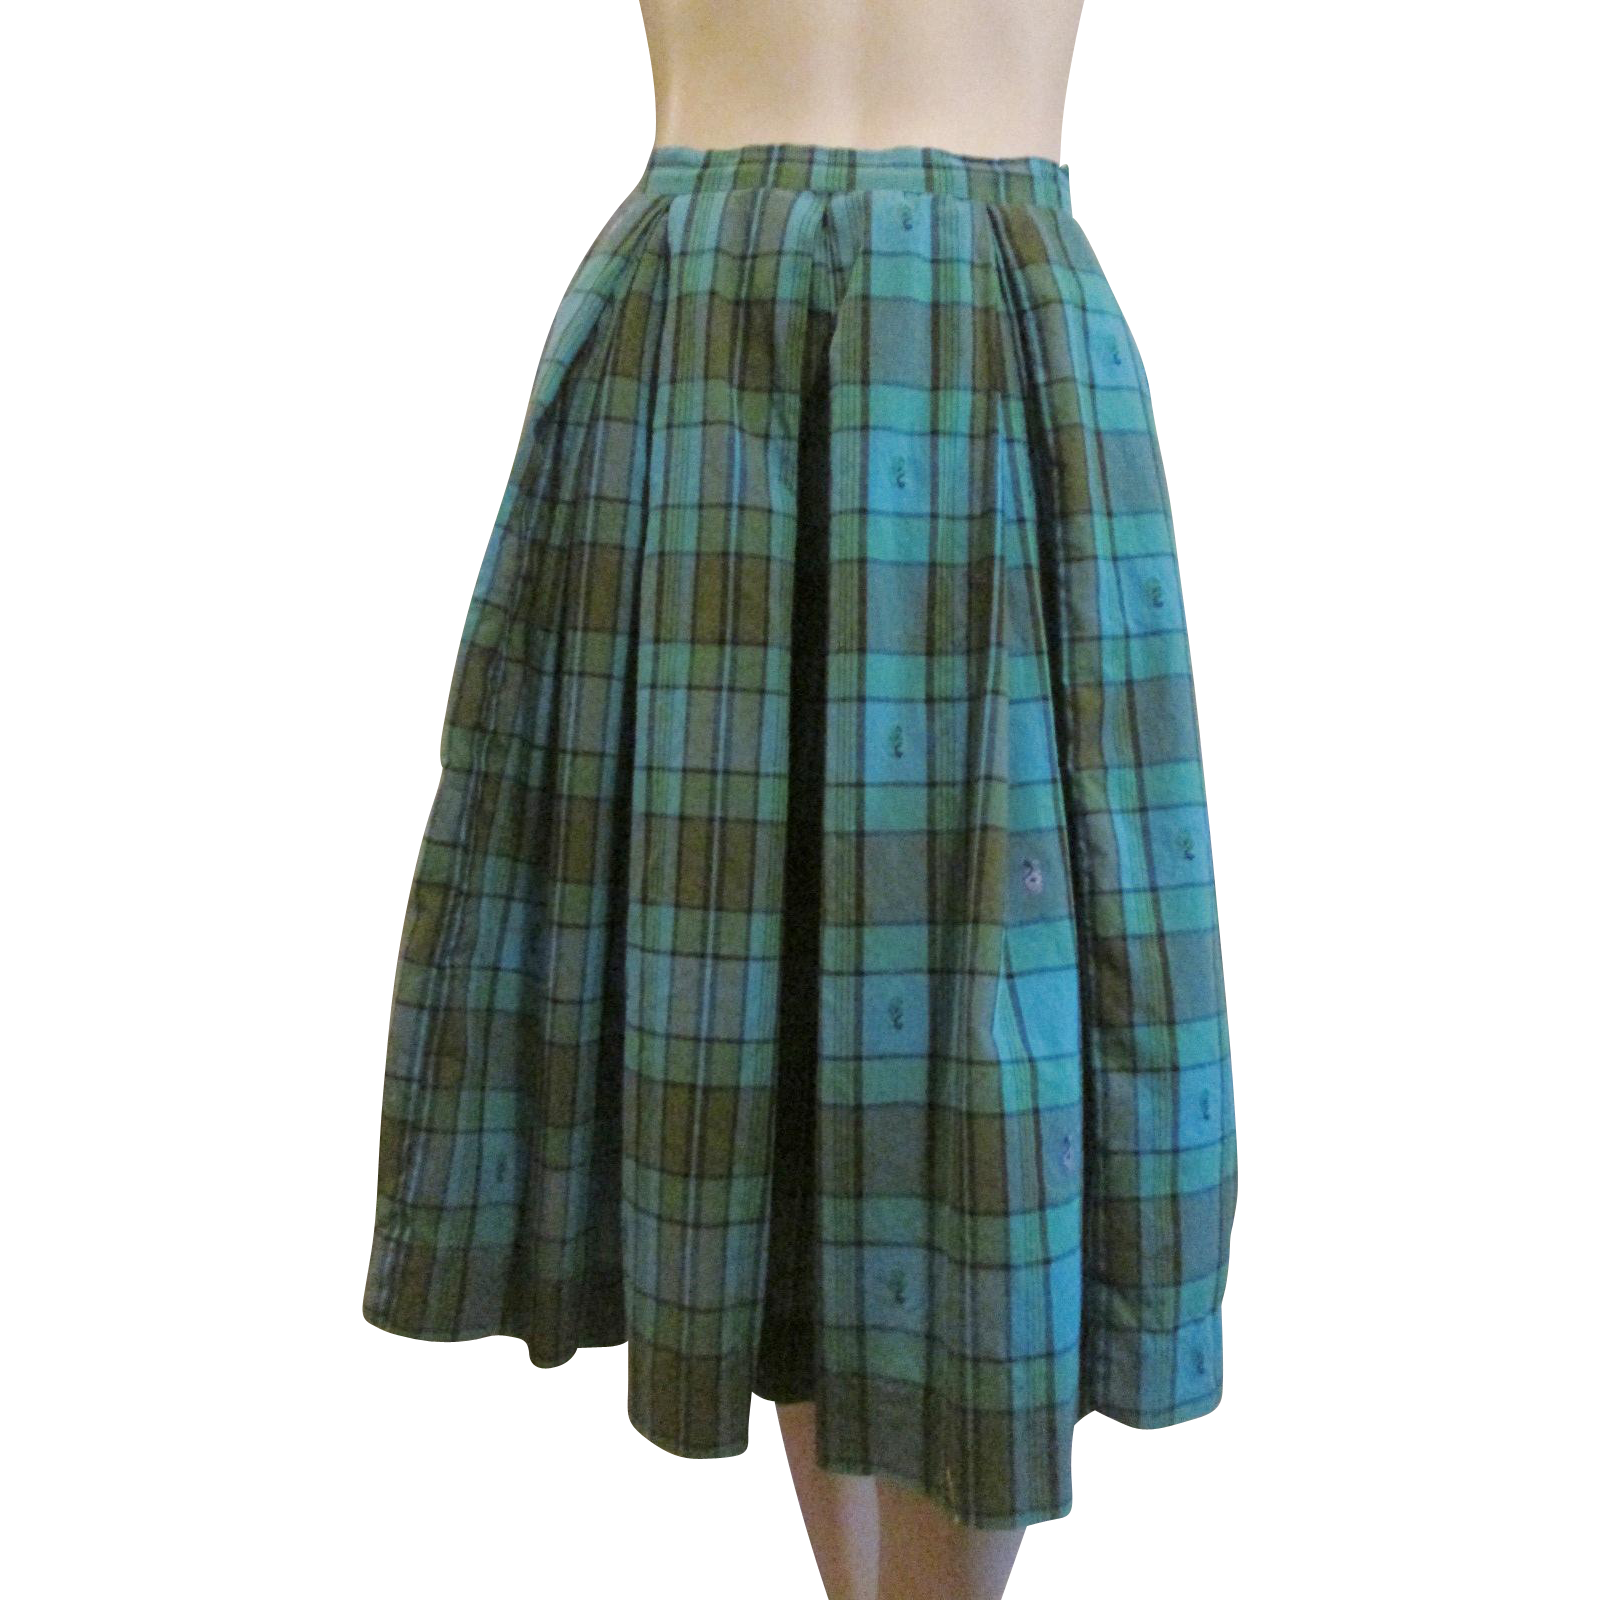 womens skirt vintage 1950s blue plaid cotton full sold on ruby lane. Black Bedroom Furniture Sets. Home Design Ideas